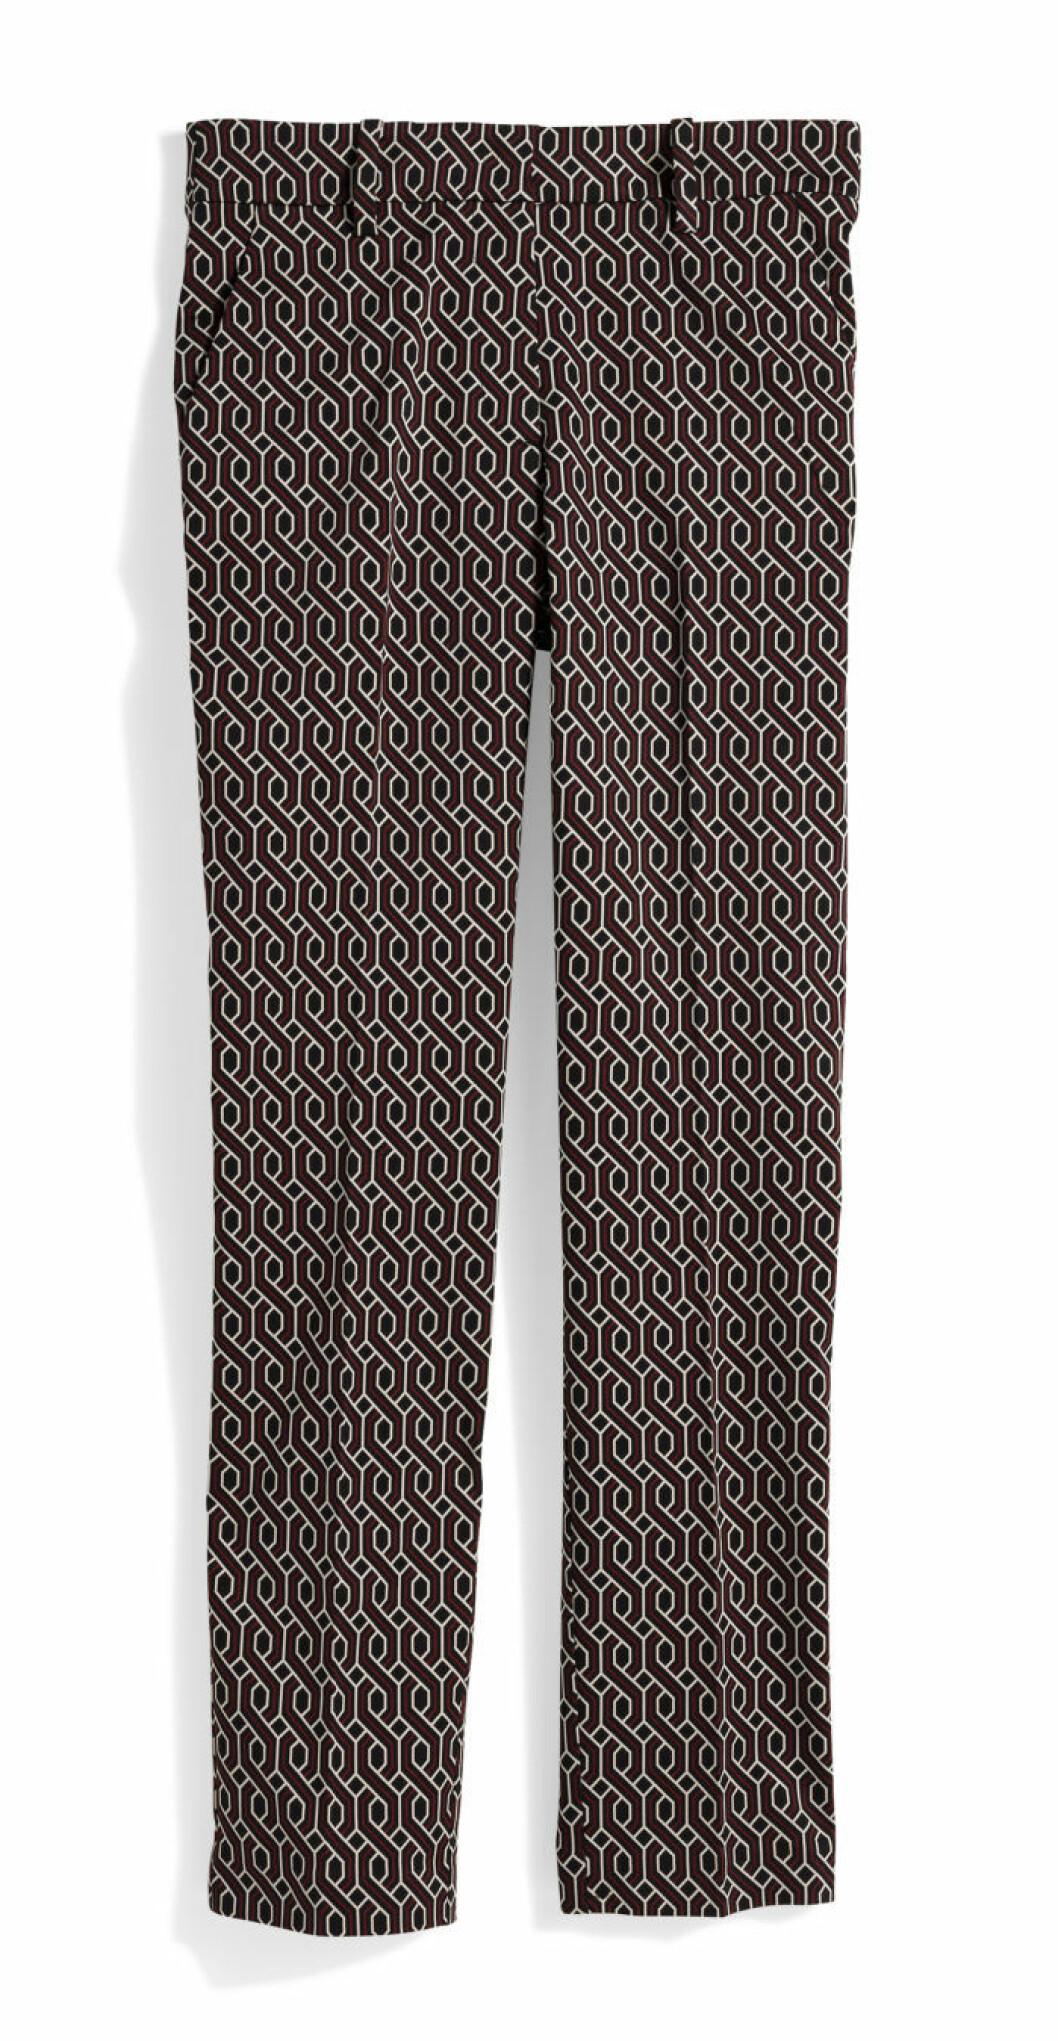 H&M GP & J Baker småmönstrade byxor